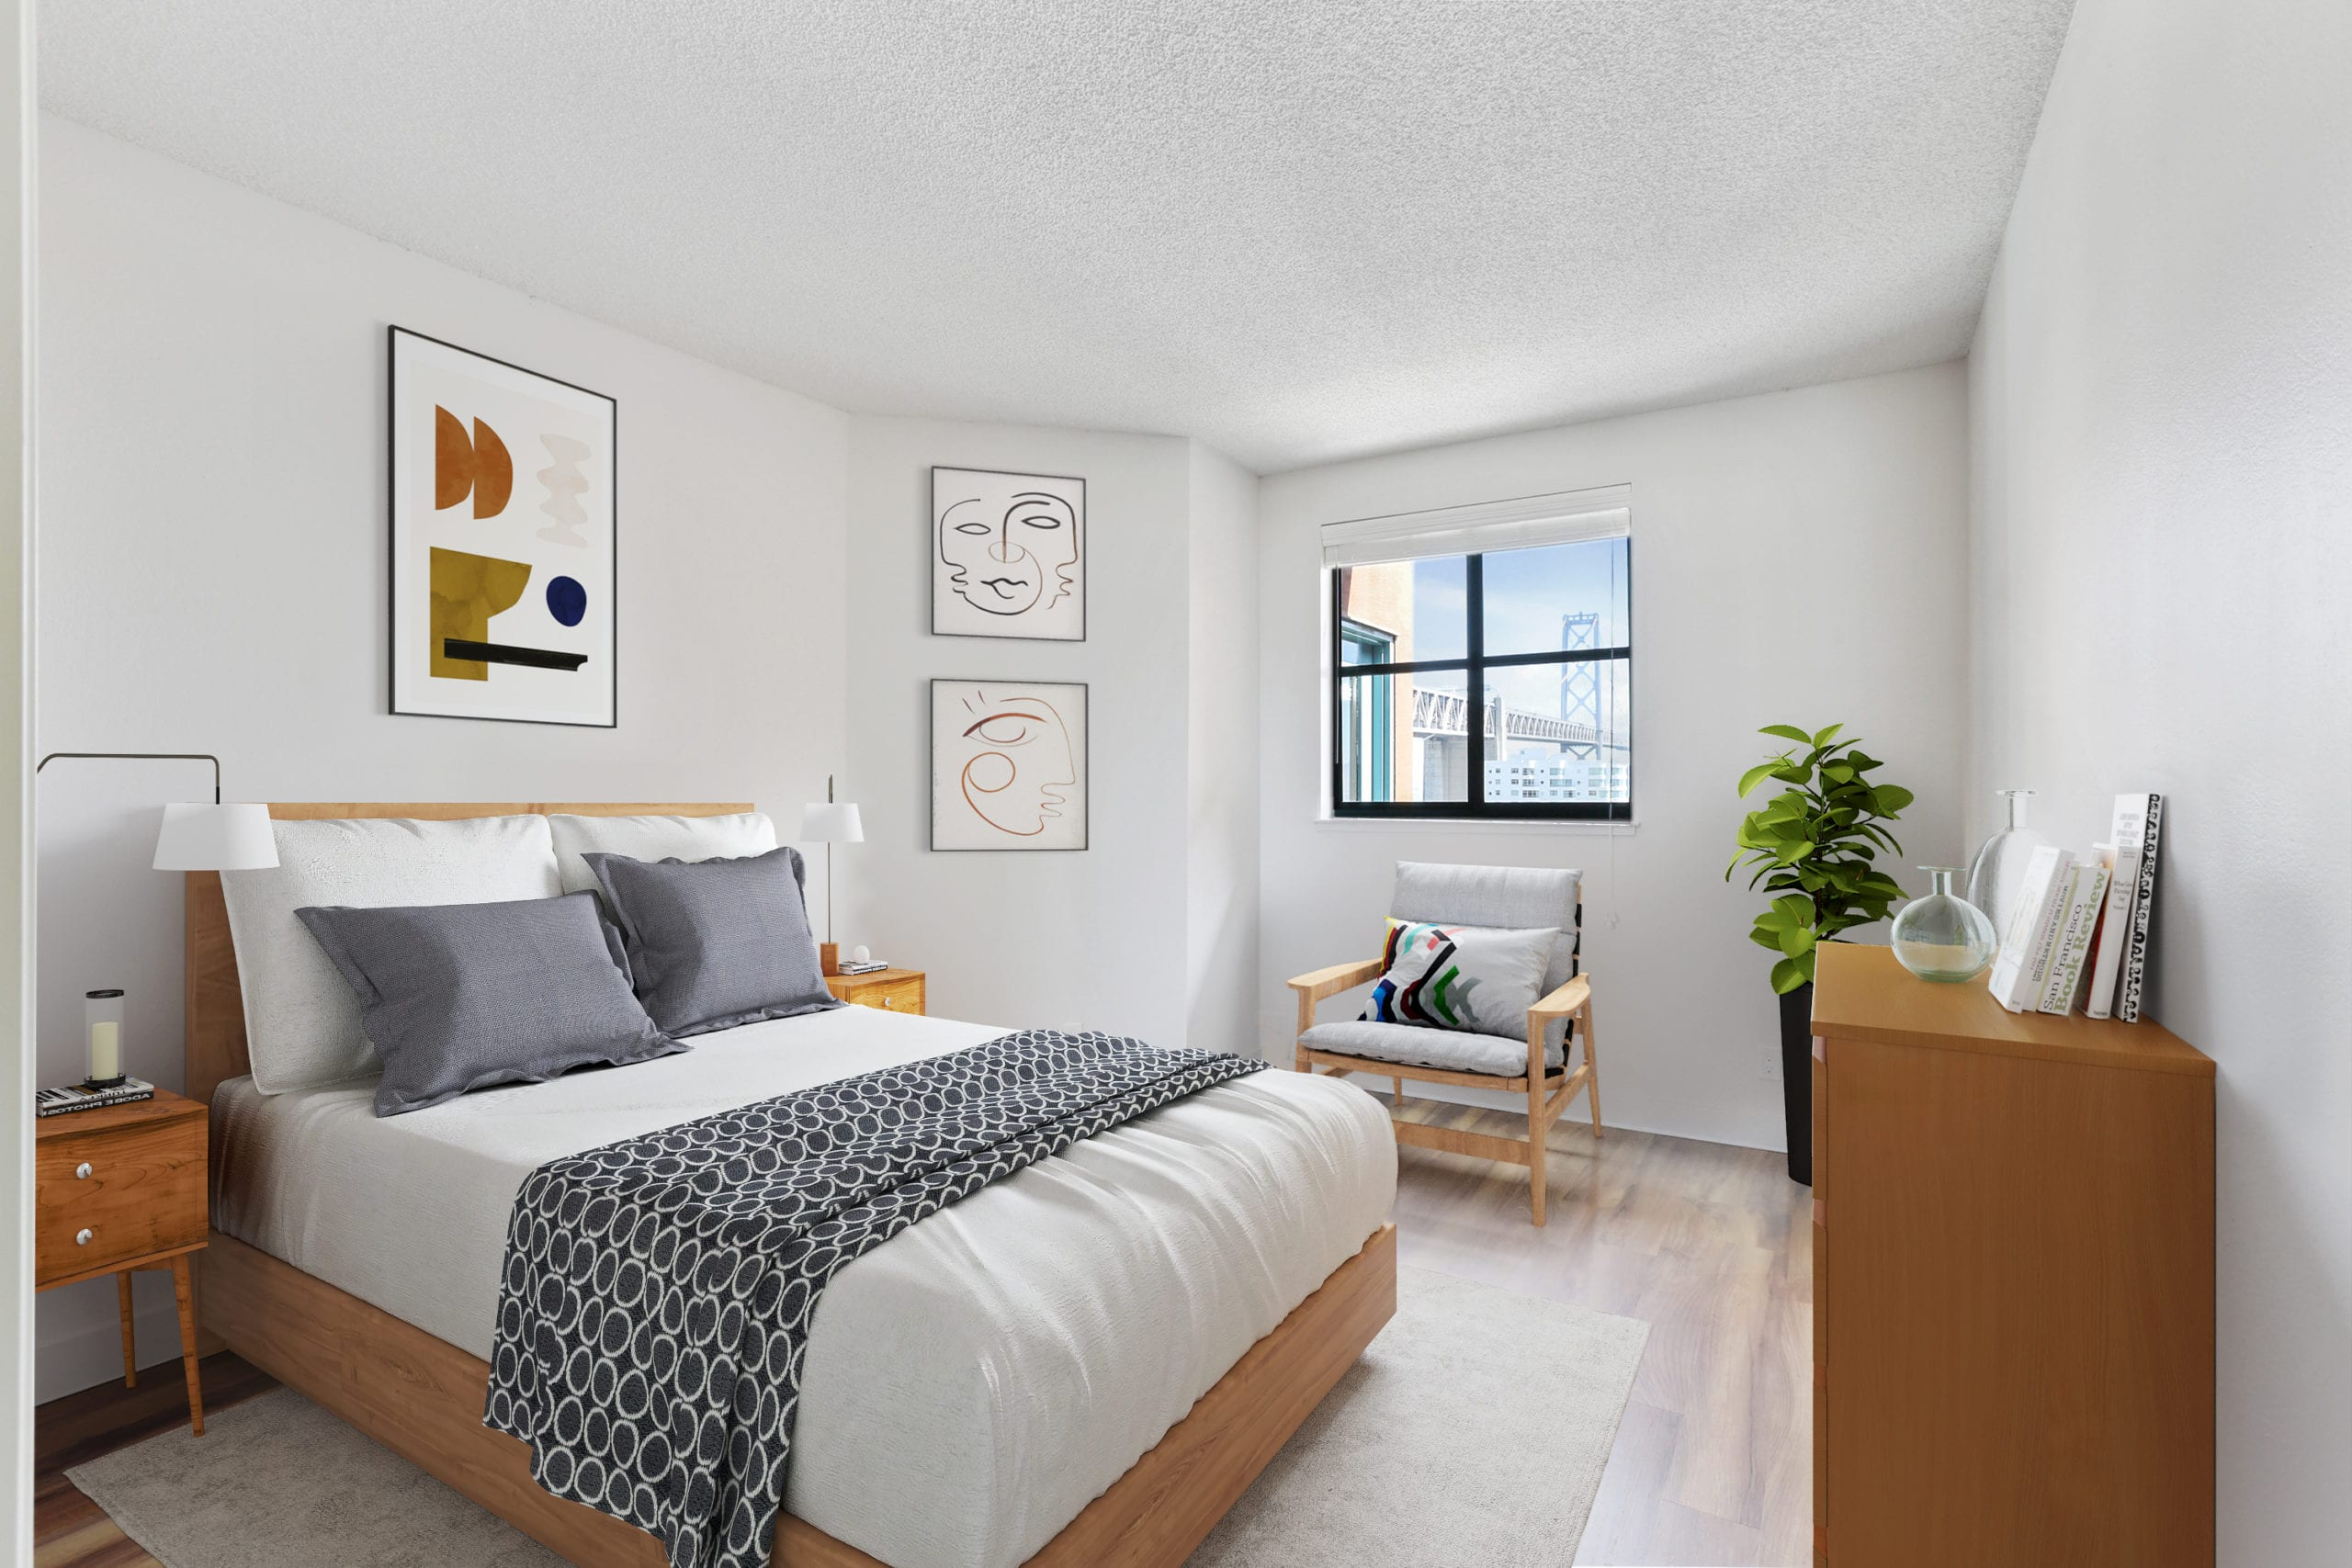 apartment bedroom with oakland bay bridge views